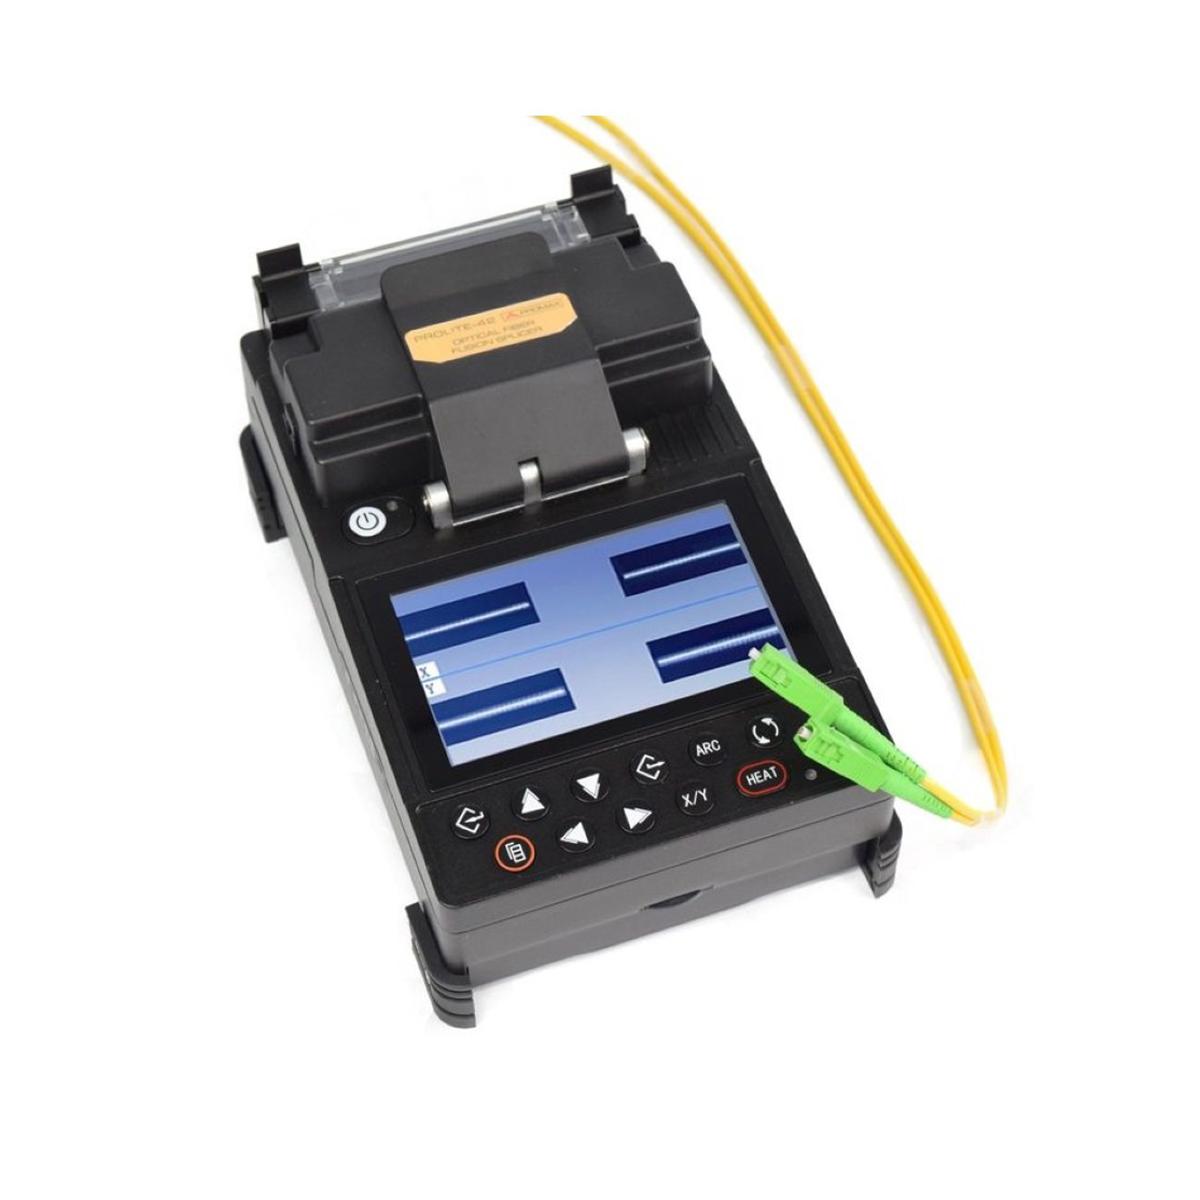 Empalmadora de fibra óptica PROMAX ProLite-42